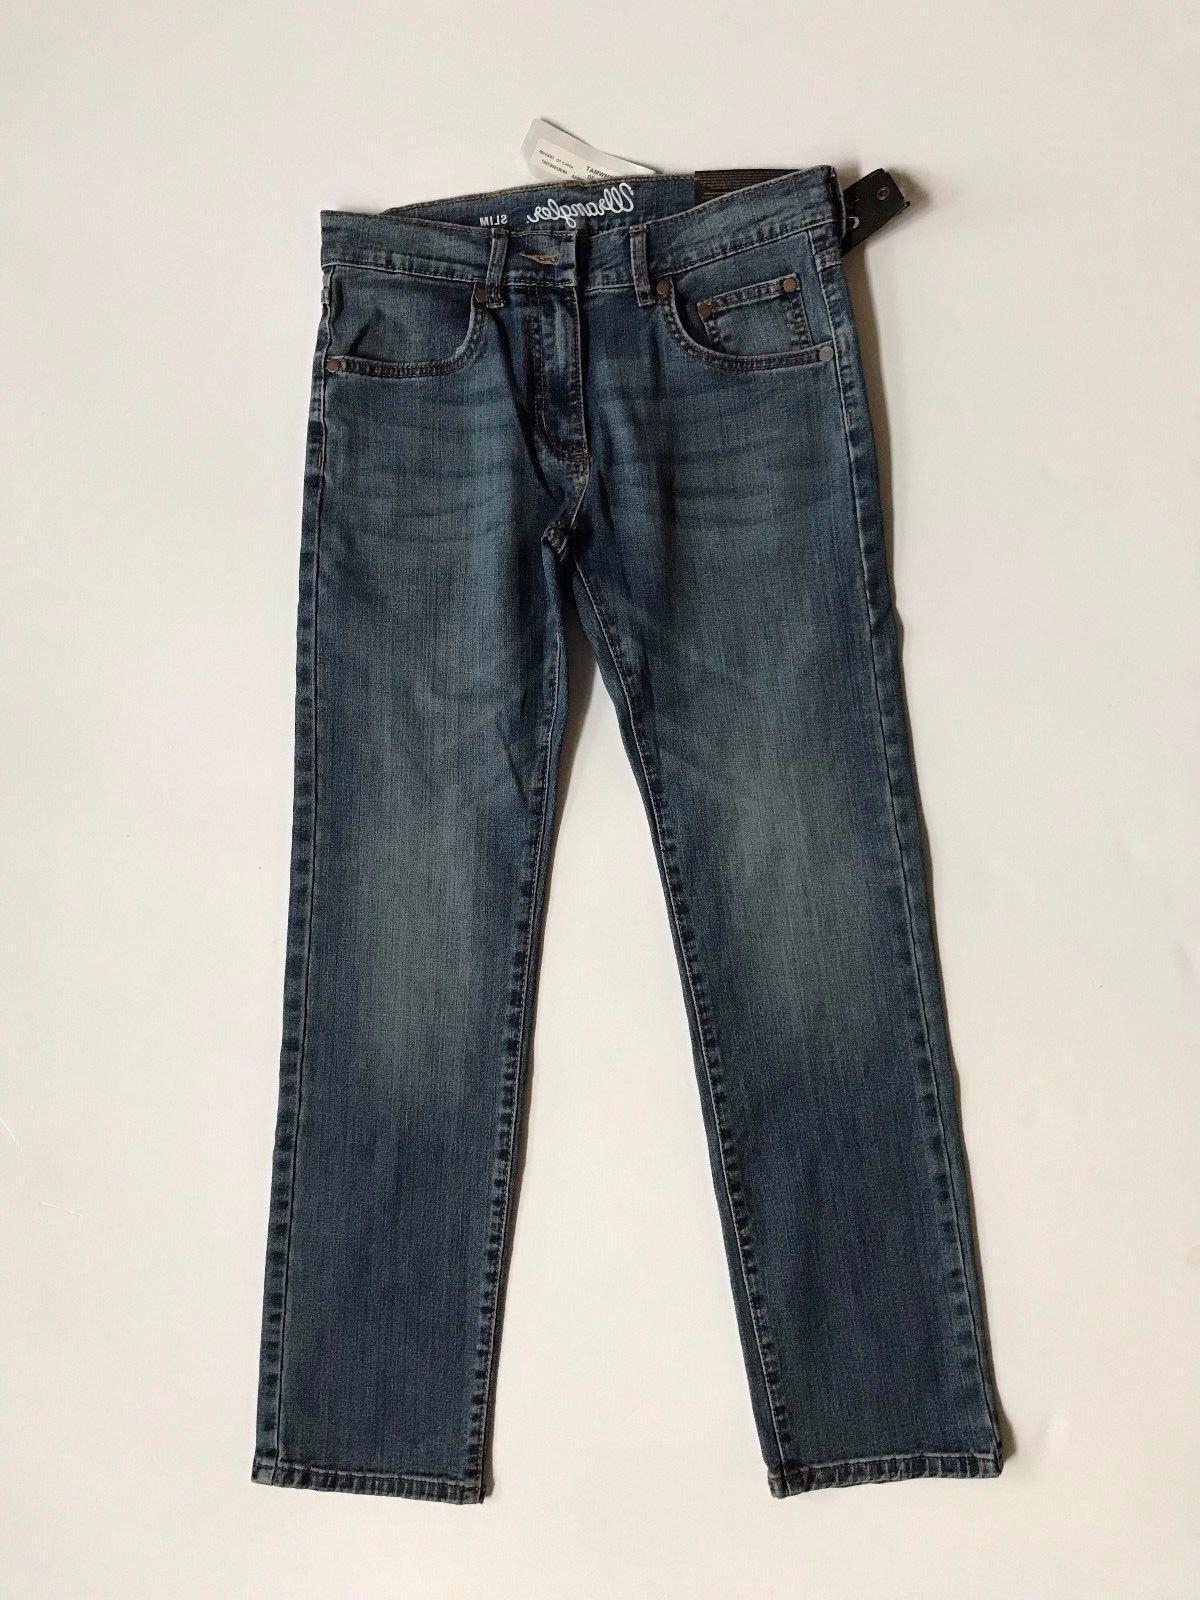 NWT Wrangler Men's Slim Fit Denim Jeans Size 87MW